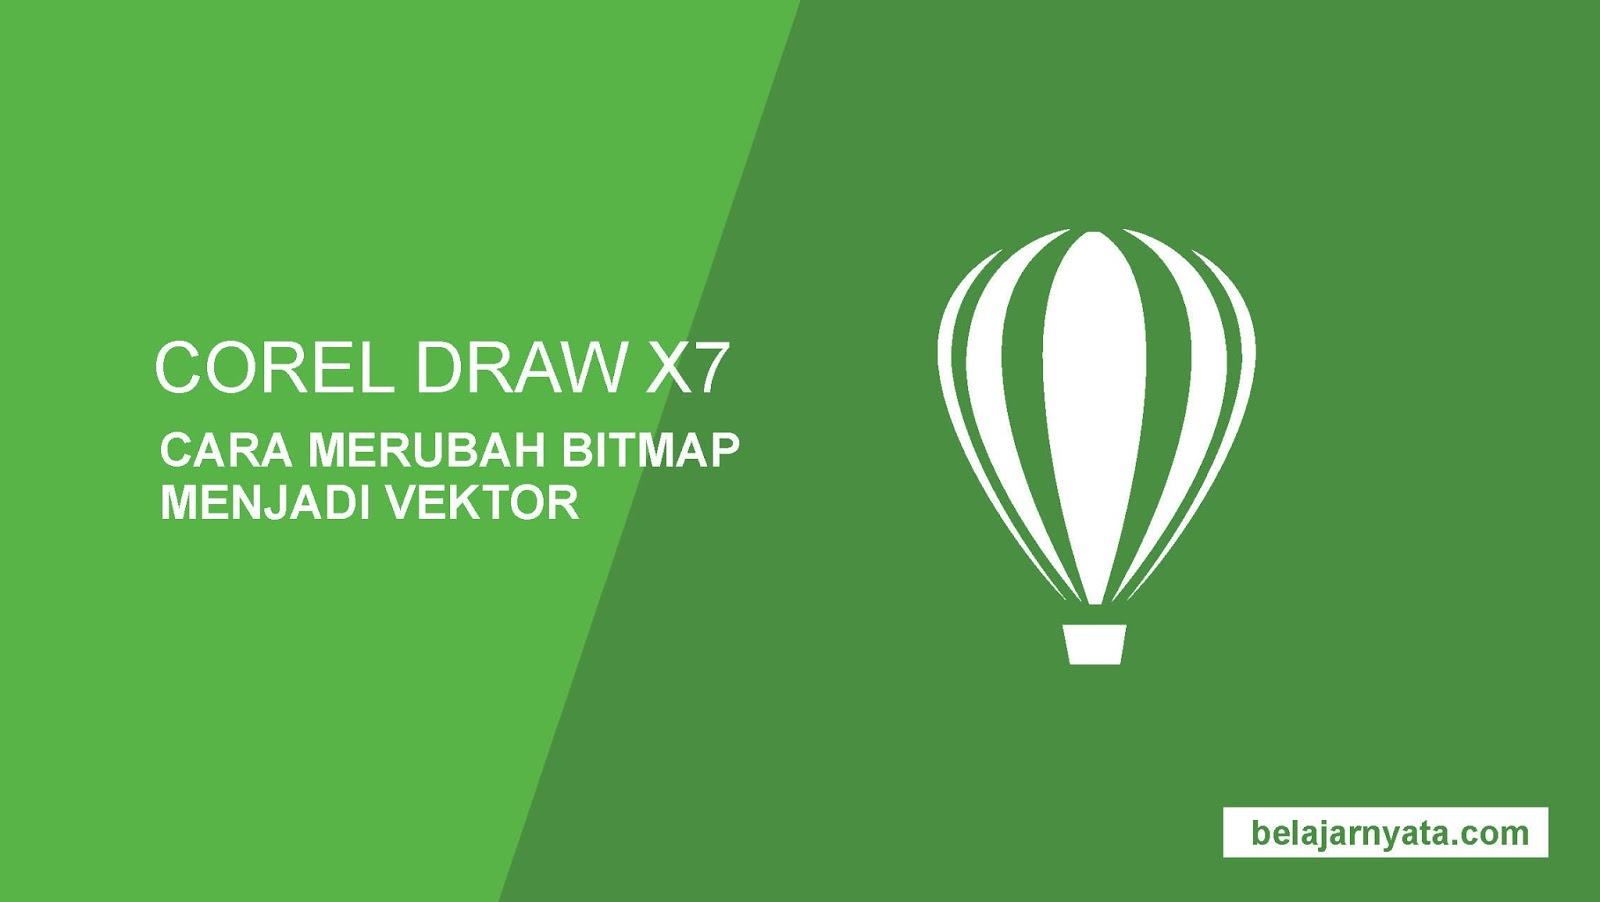 Cara Merubah Gambar Bitmap Agar Menjadi File Vektor Dengan Coreldraw X7